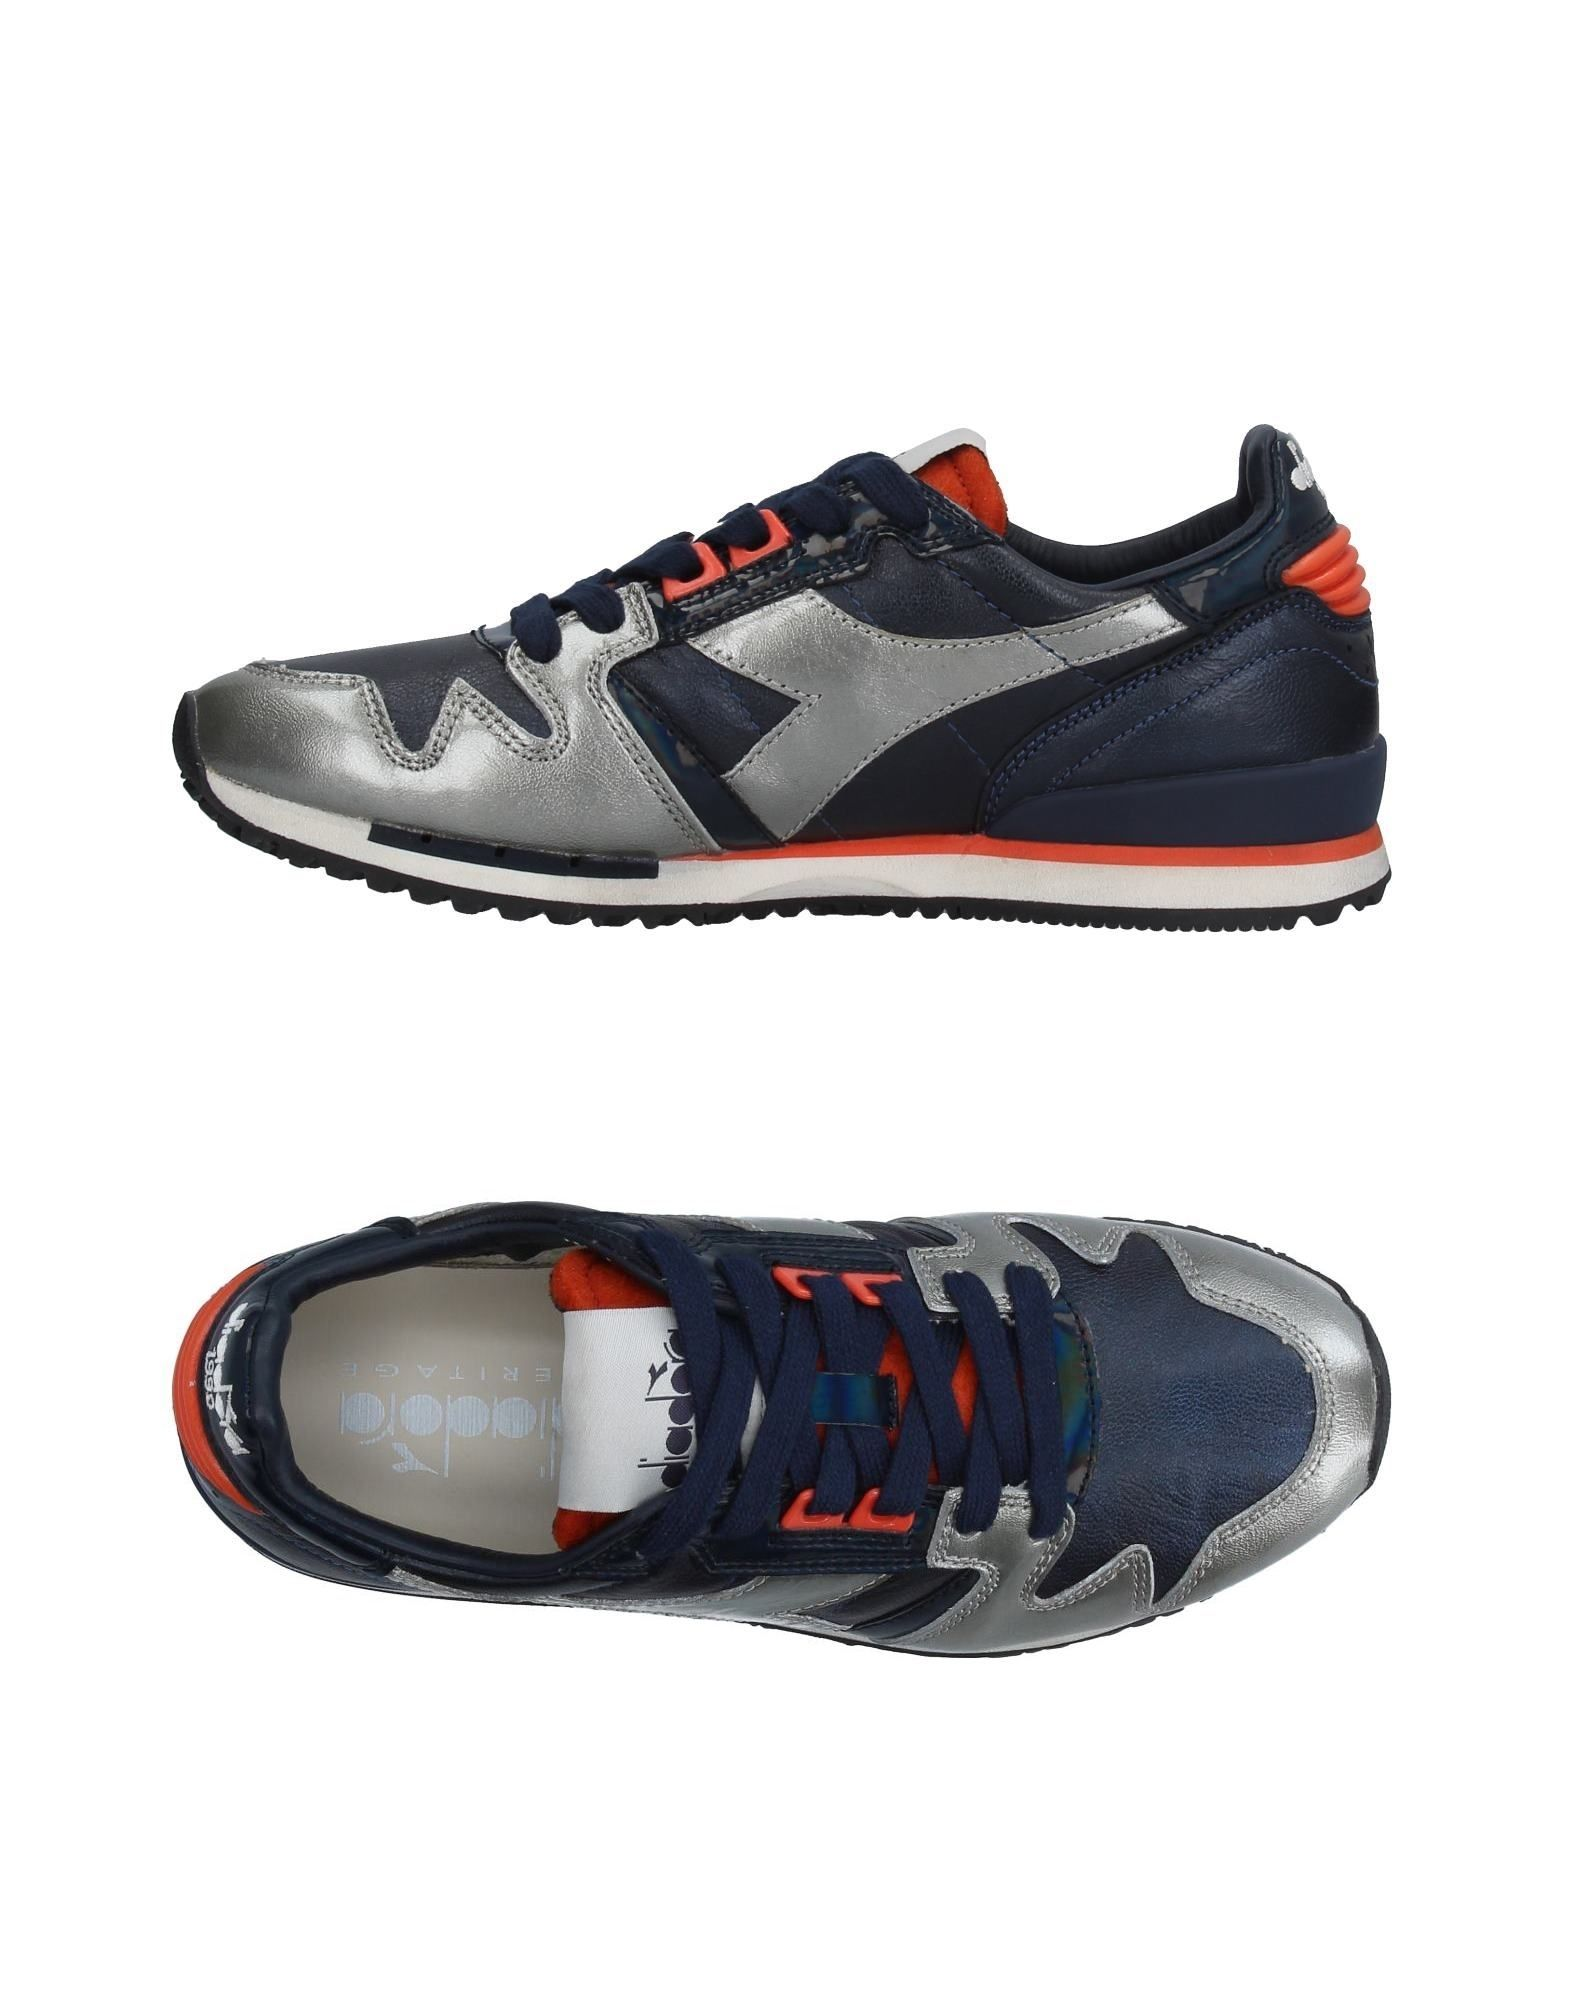 Diadora 11233121WG Heritage Sneakers Damen  11233121WG Diadora Gute Qualität beliebte Schuhe 2aee47